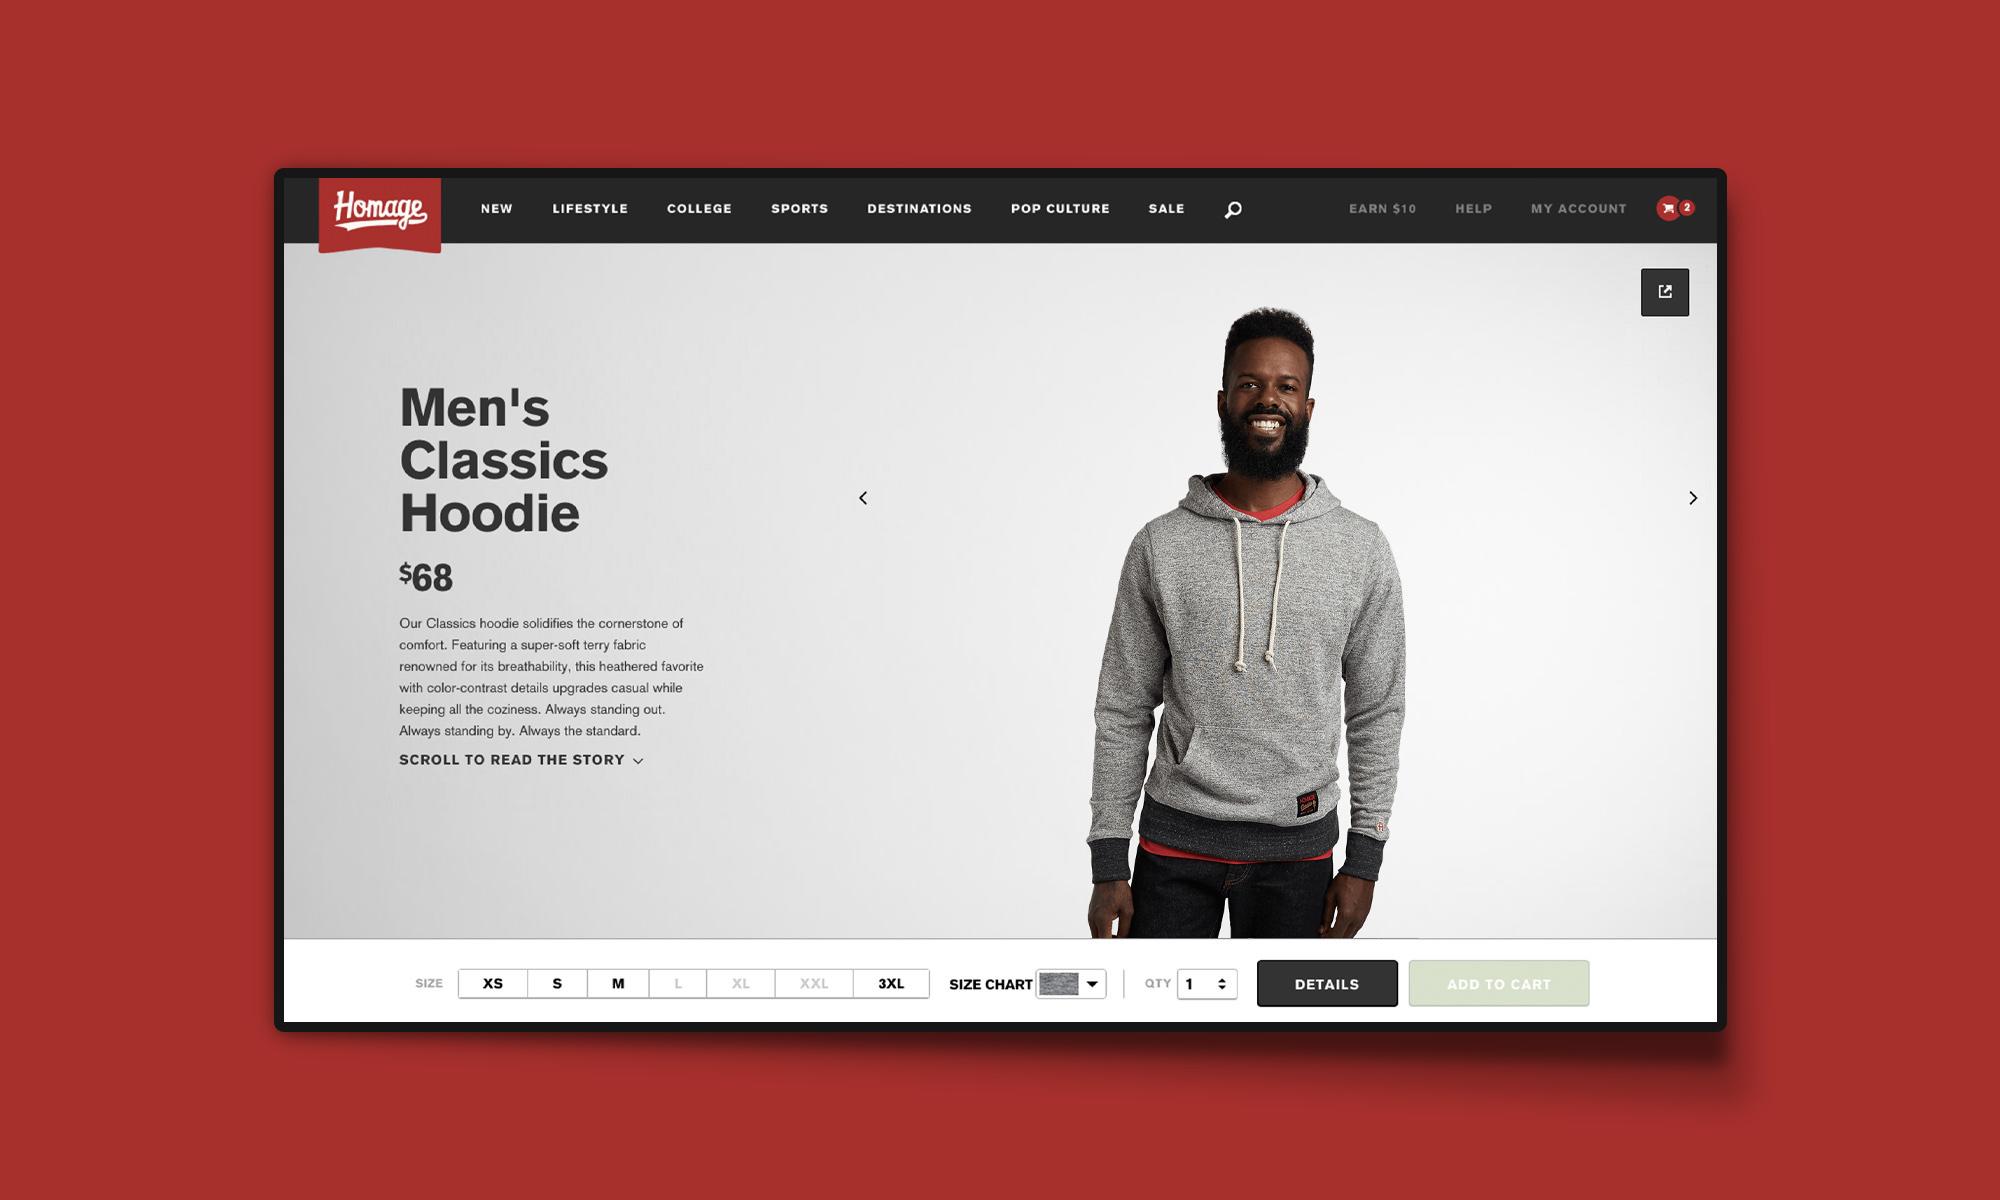 hco-redesign-cali-looks-desktop.jpg